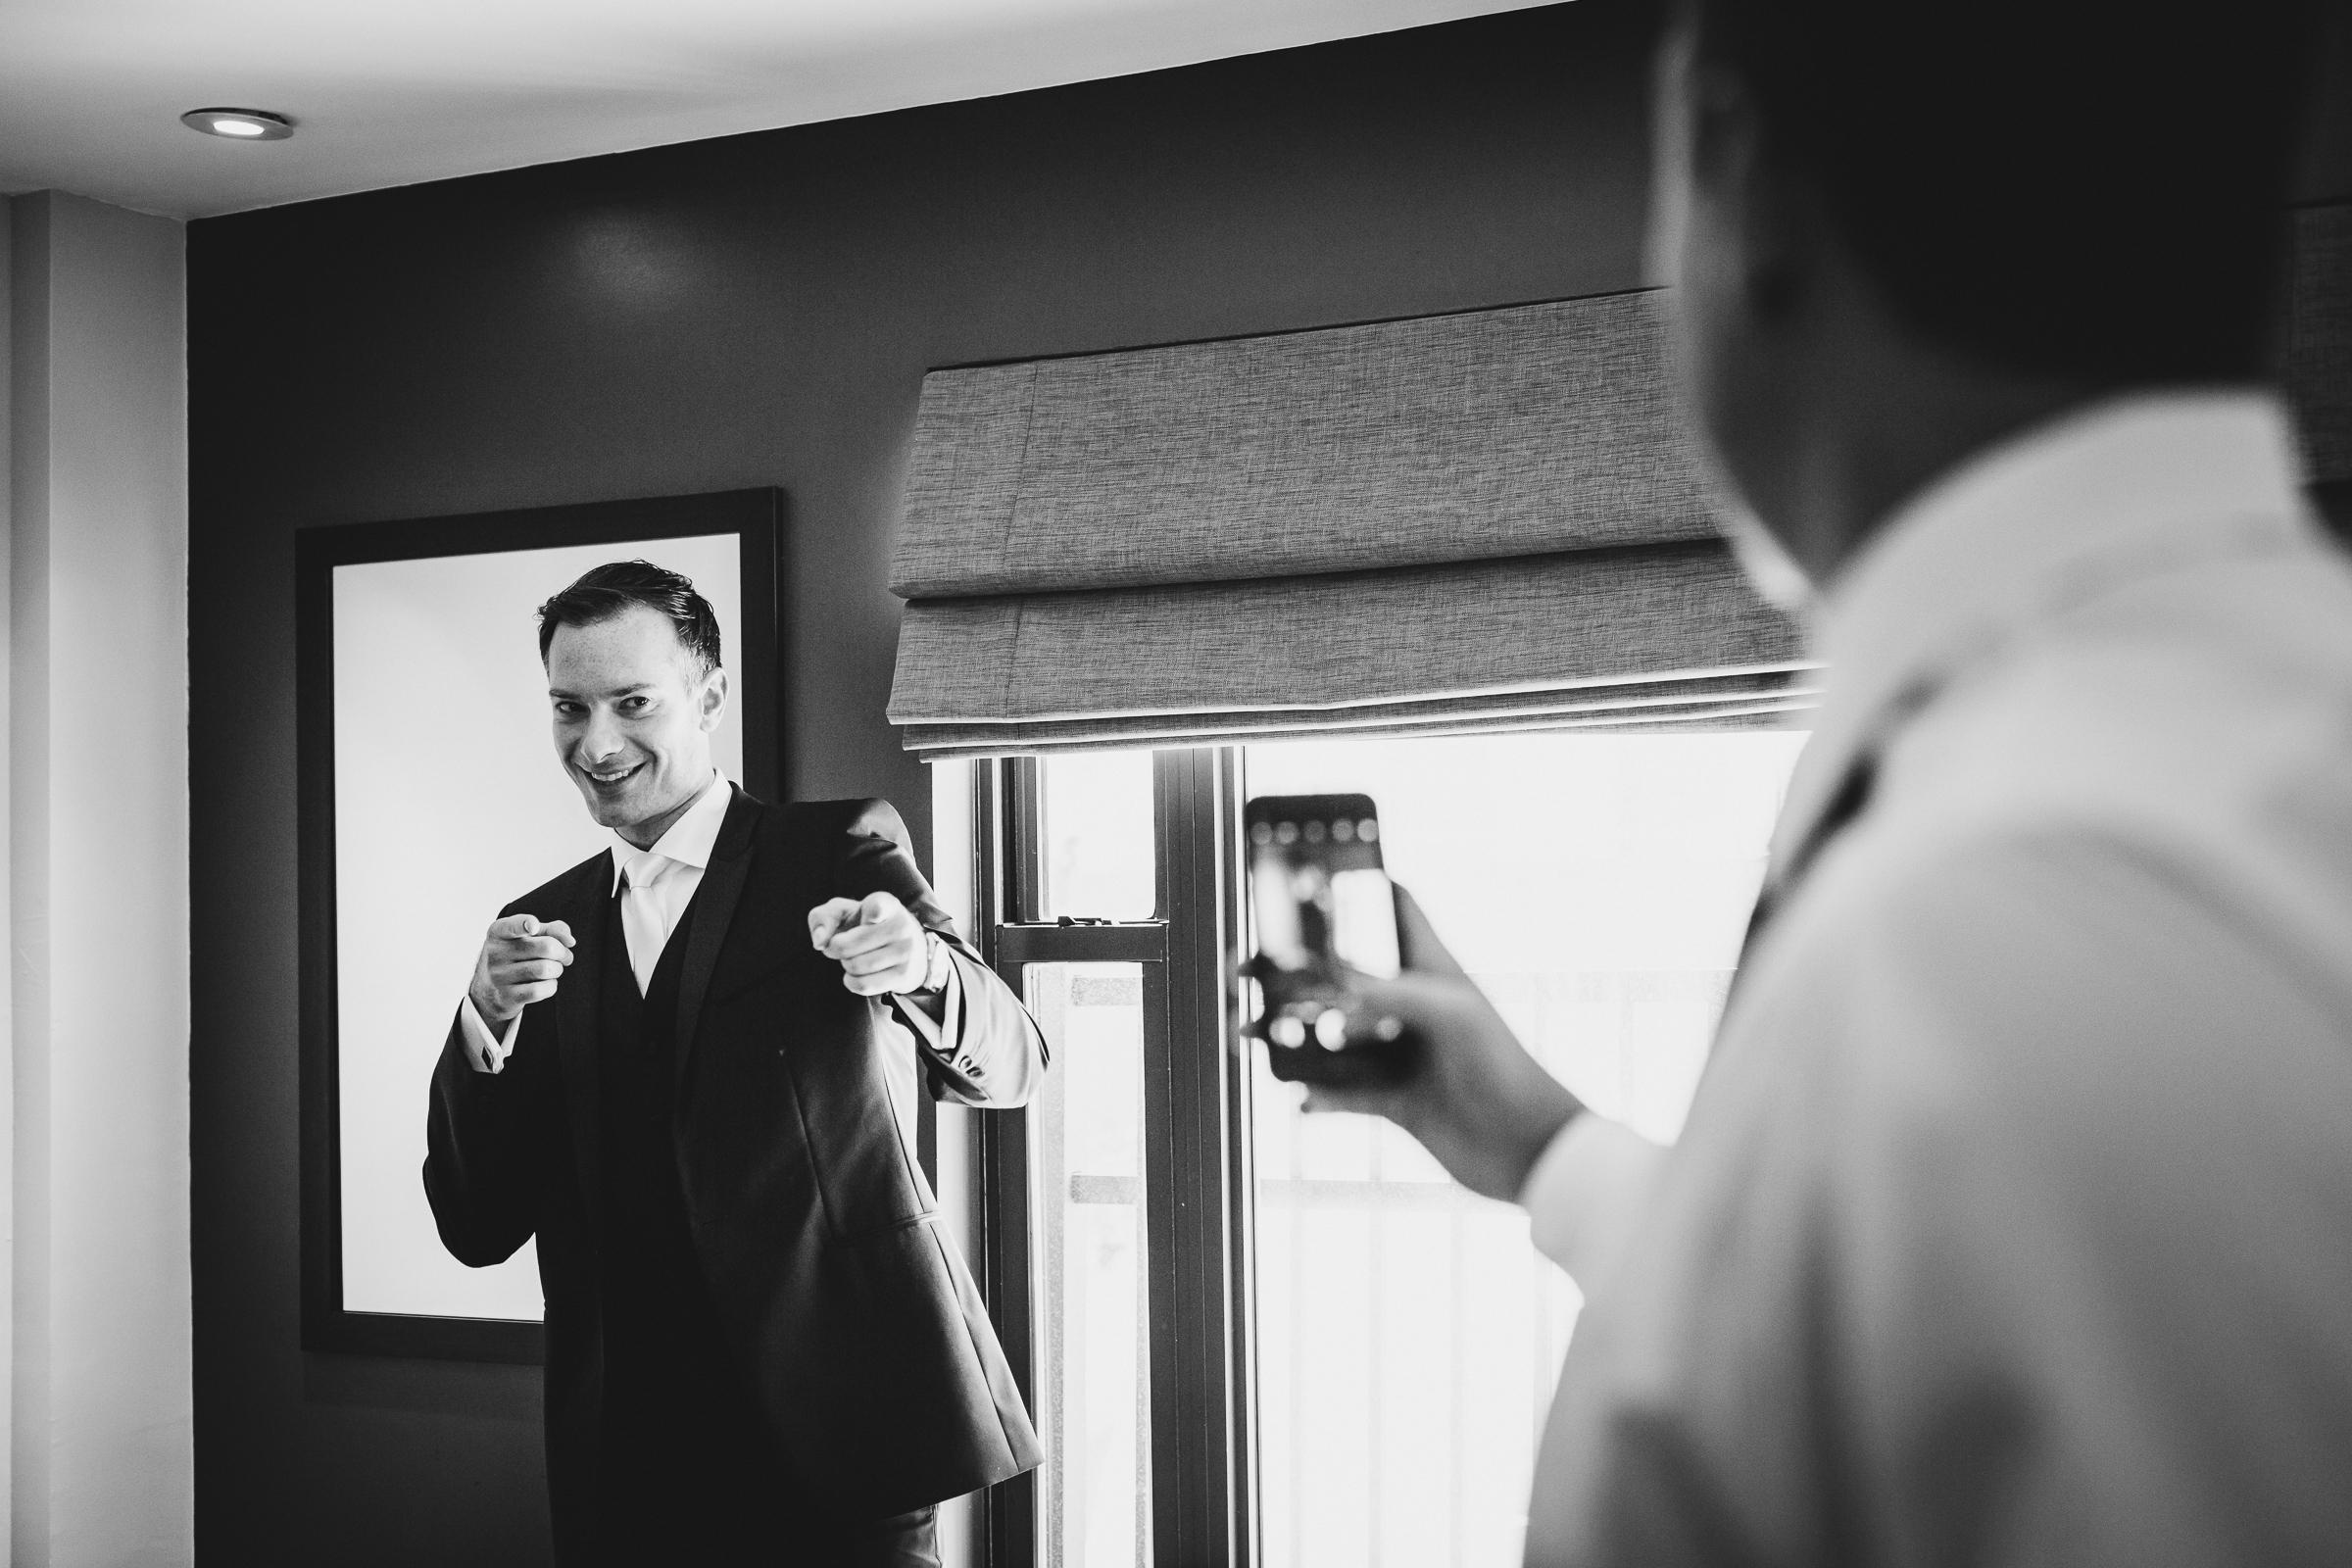 Ravel-Hotel-Penthouse-808-Long-Island-City-New-York-Documentary-Wedding-Photographer-19.jpg